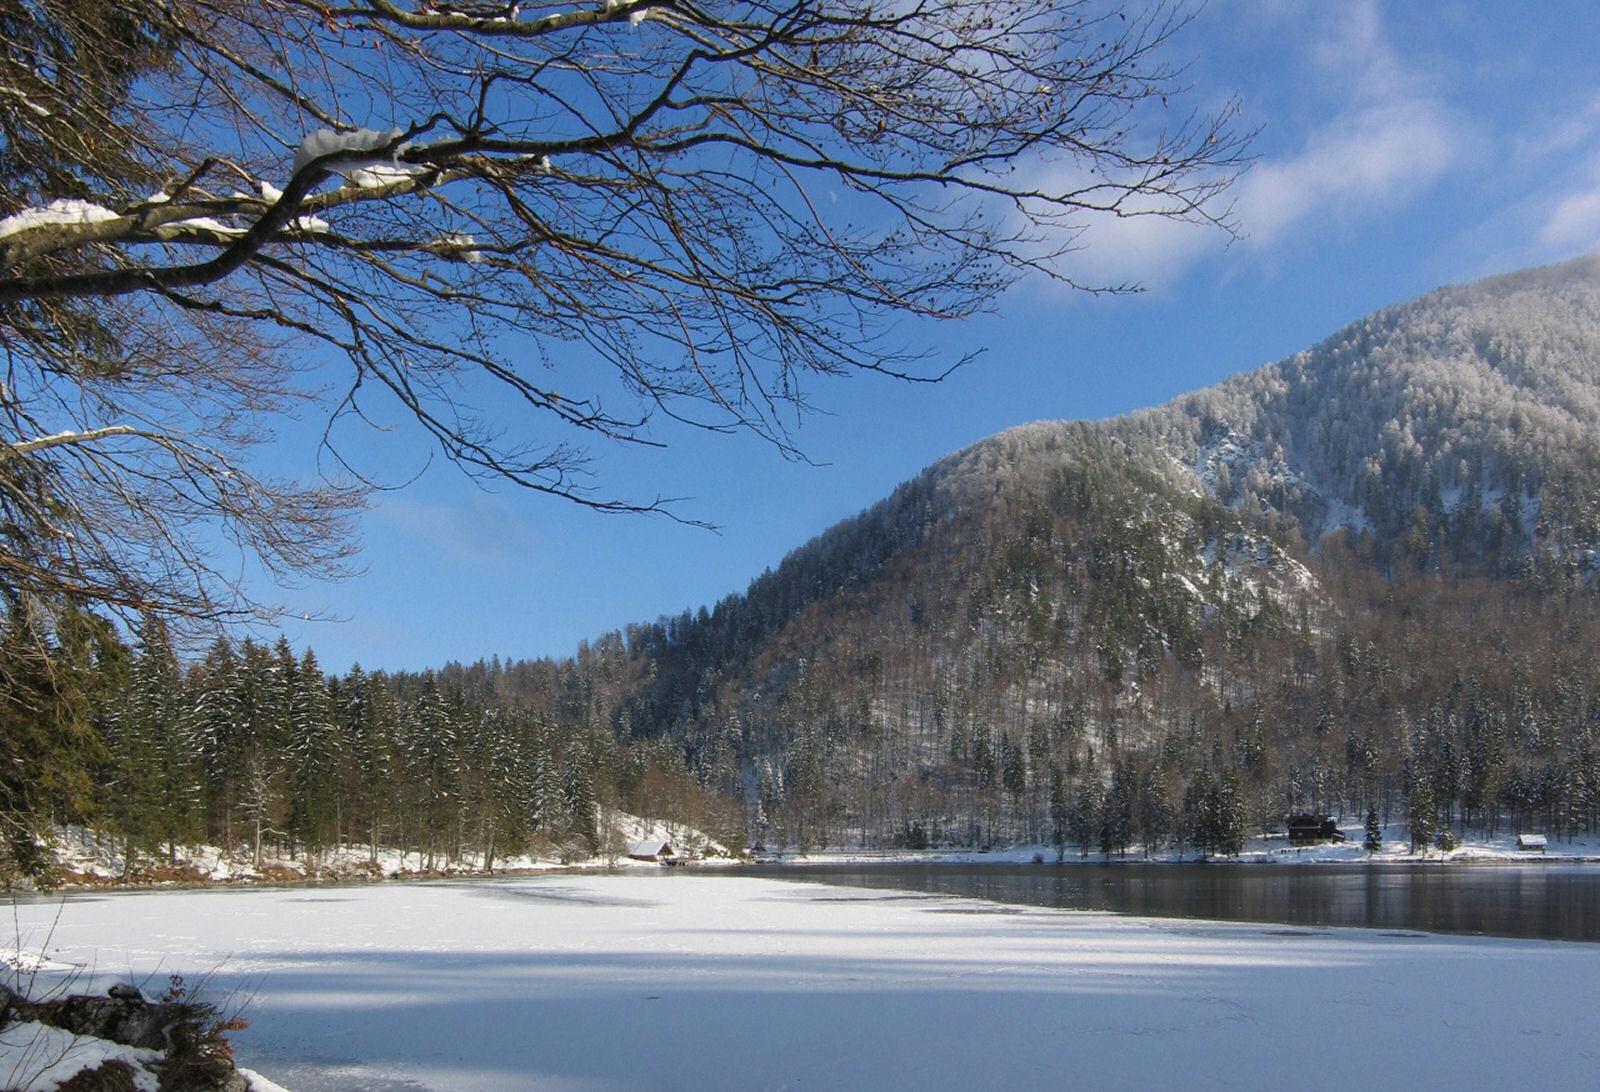 fusine-lakes-winter-04-italy